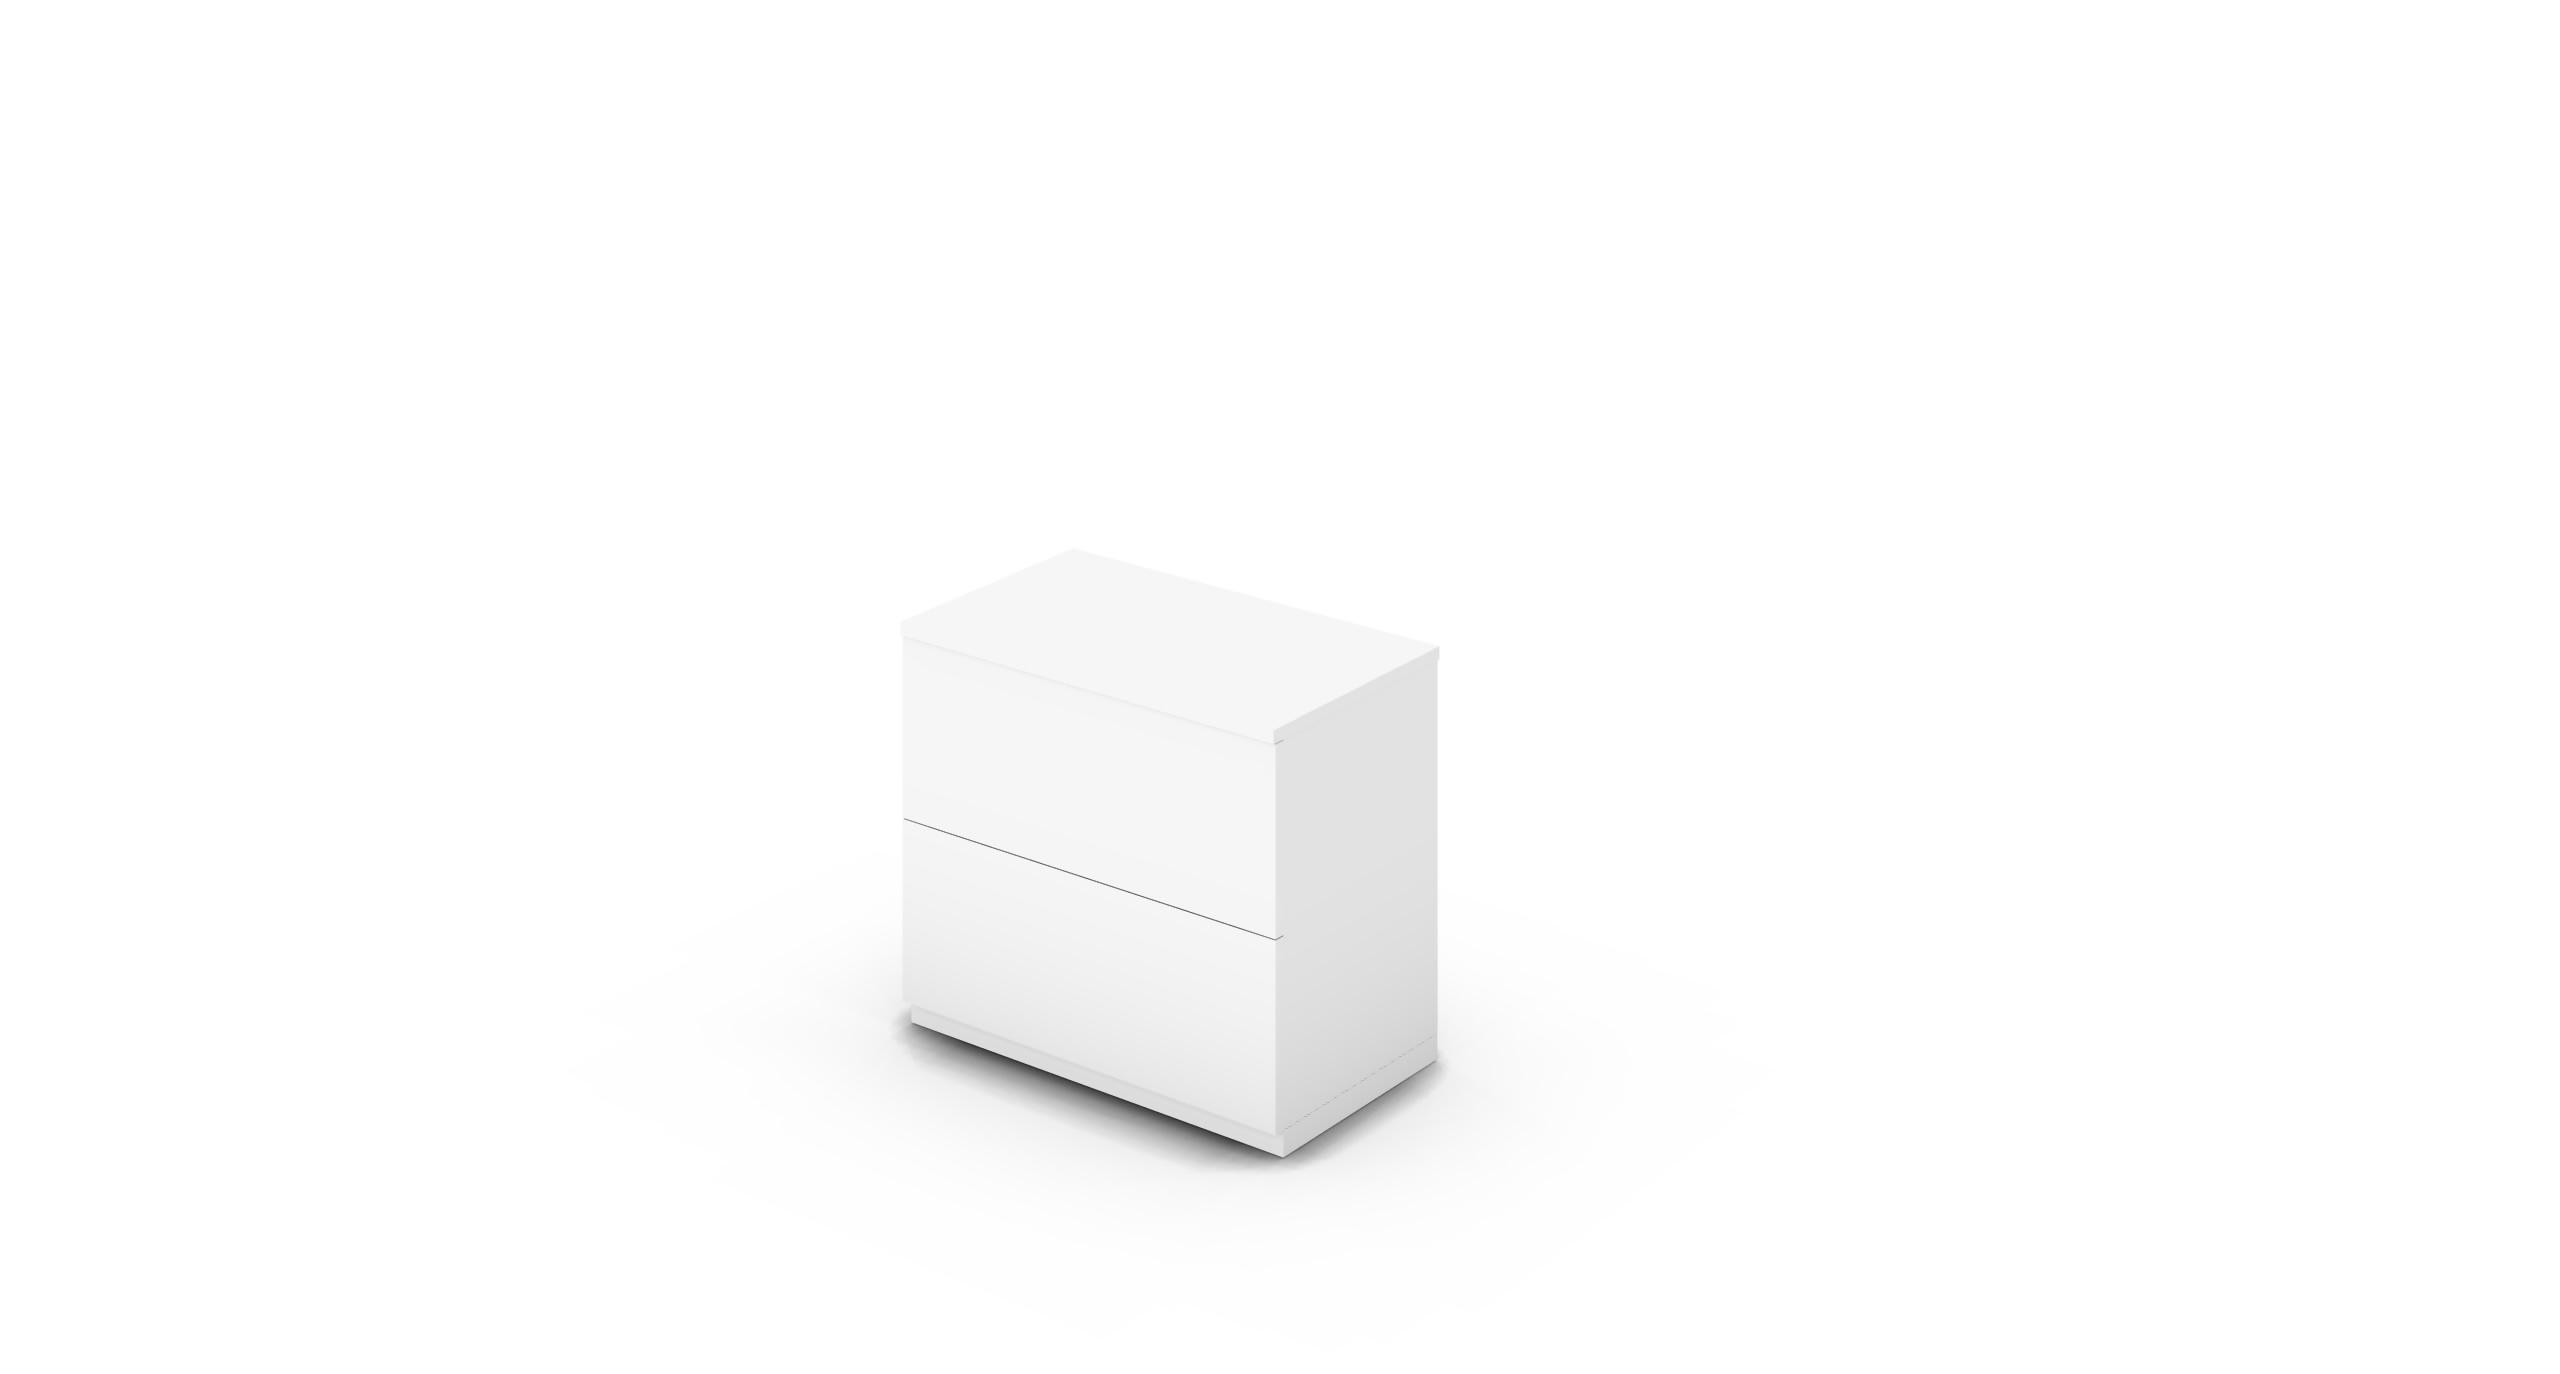 Cabinet_800x450x775_DR_White_Push_NoCylinder